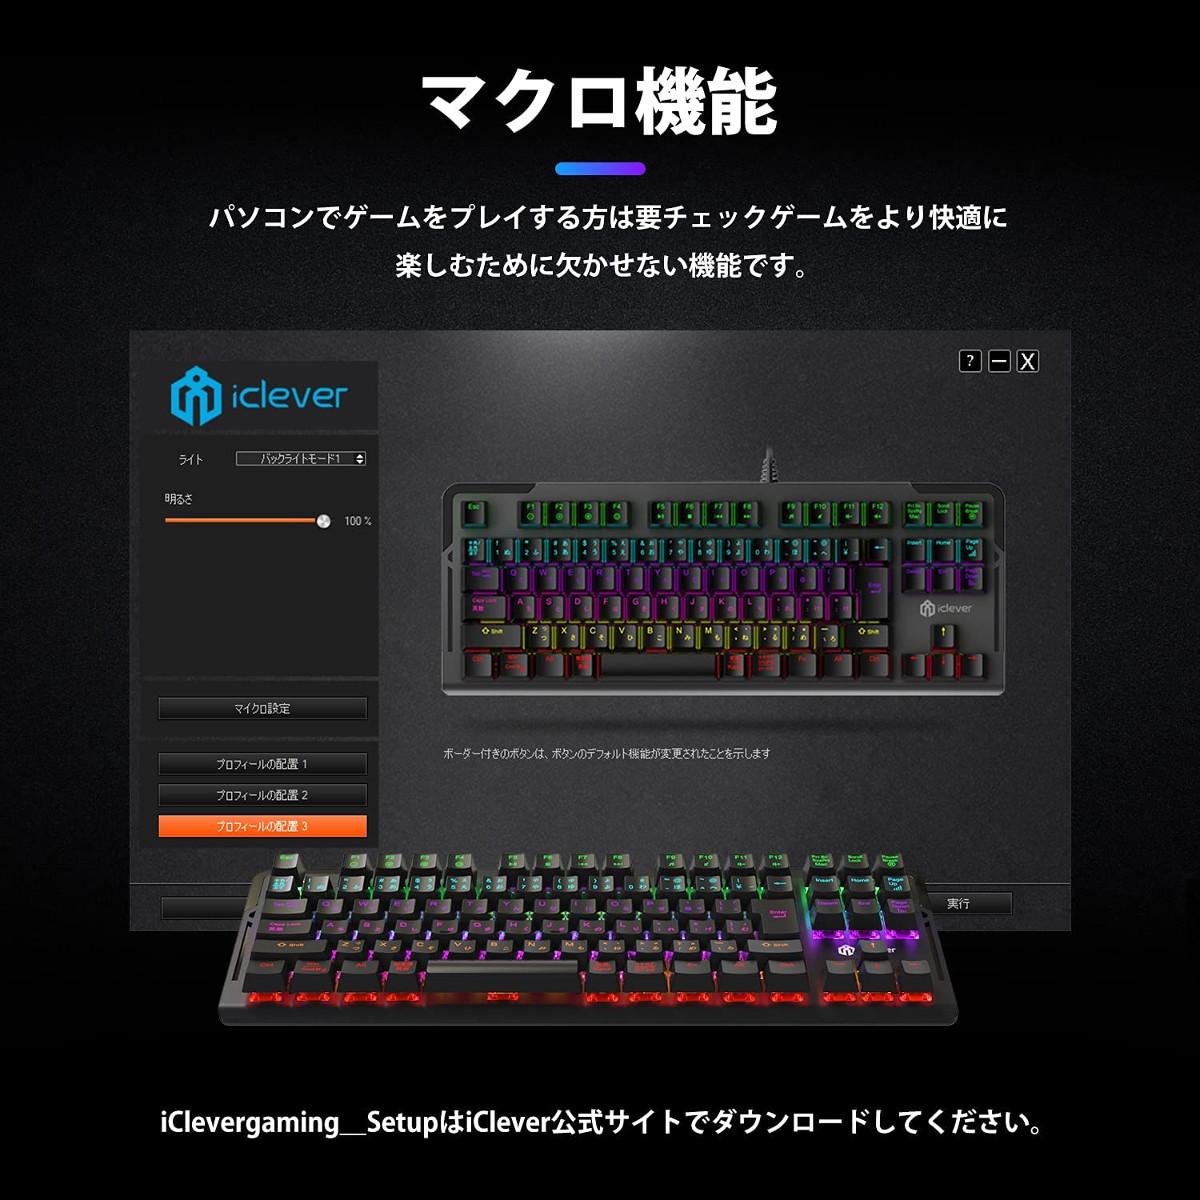 iClever 赤軸メカニカルキーボード G01